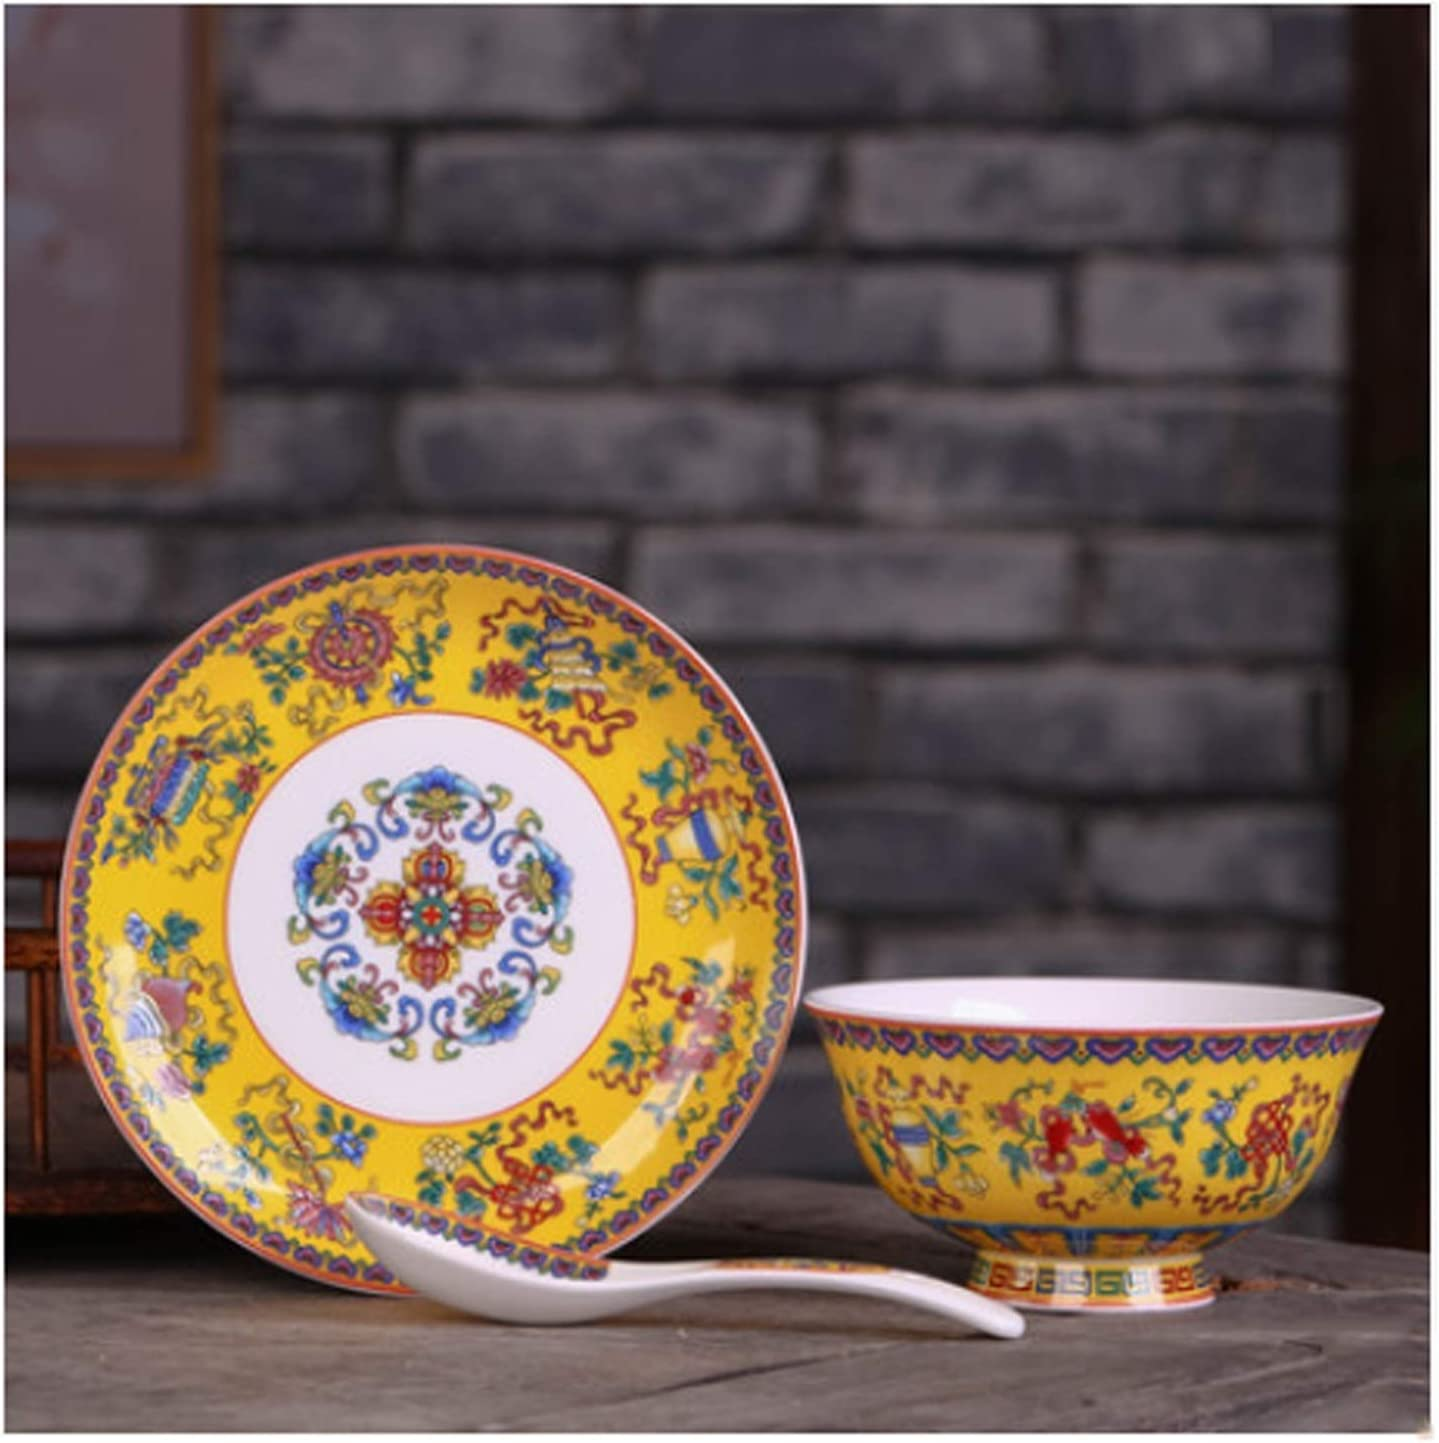 Dessert Spoon Topics on TV Three-piece set of Chinese china an household San Diego Mall bone